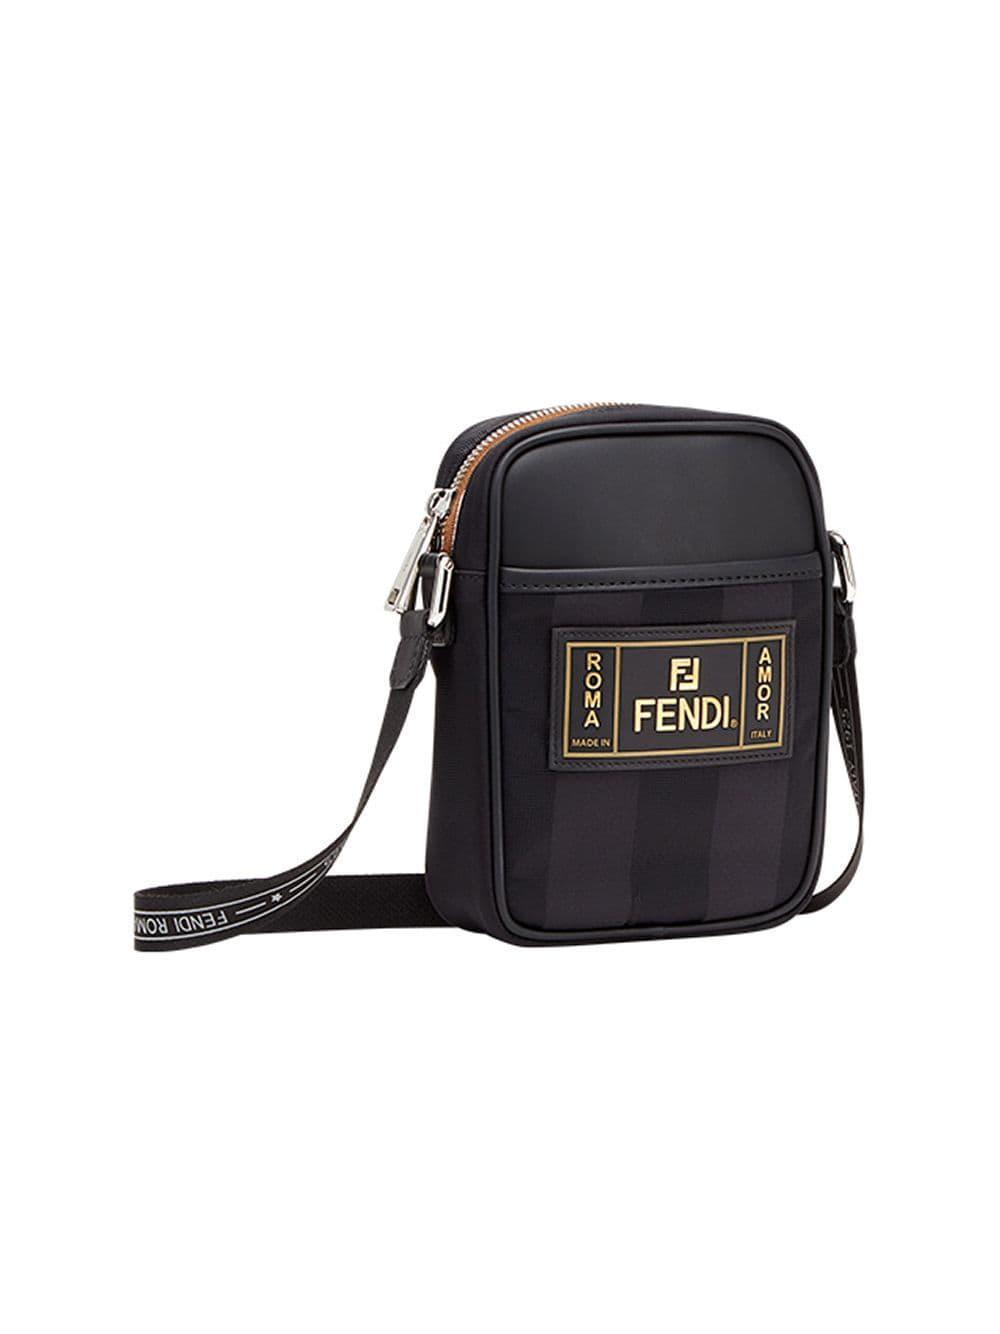 a6b9f32a6fce Fendi Small Cross Body Bag in Black for Men - Lyst